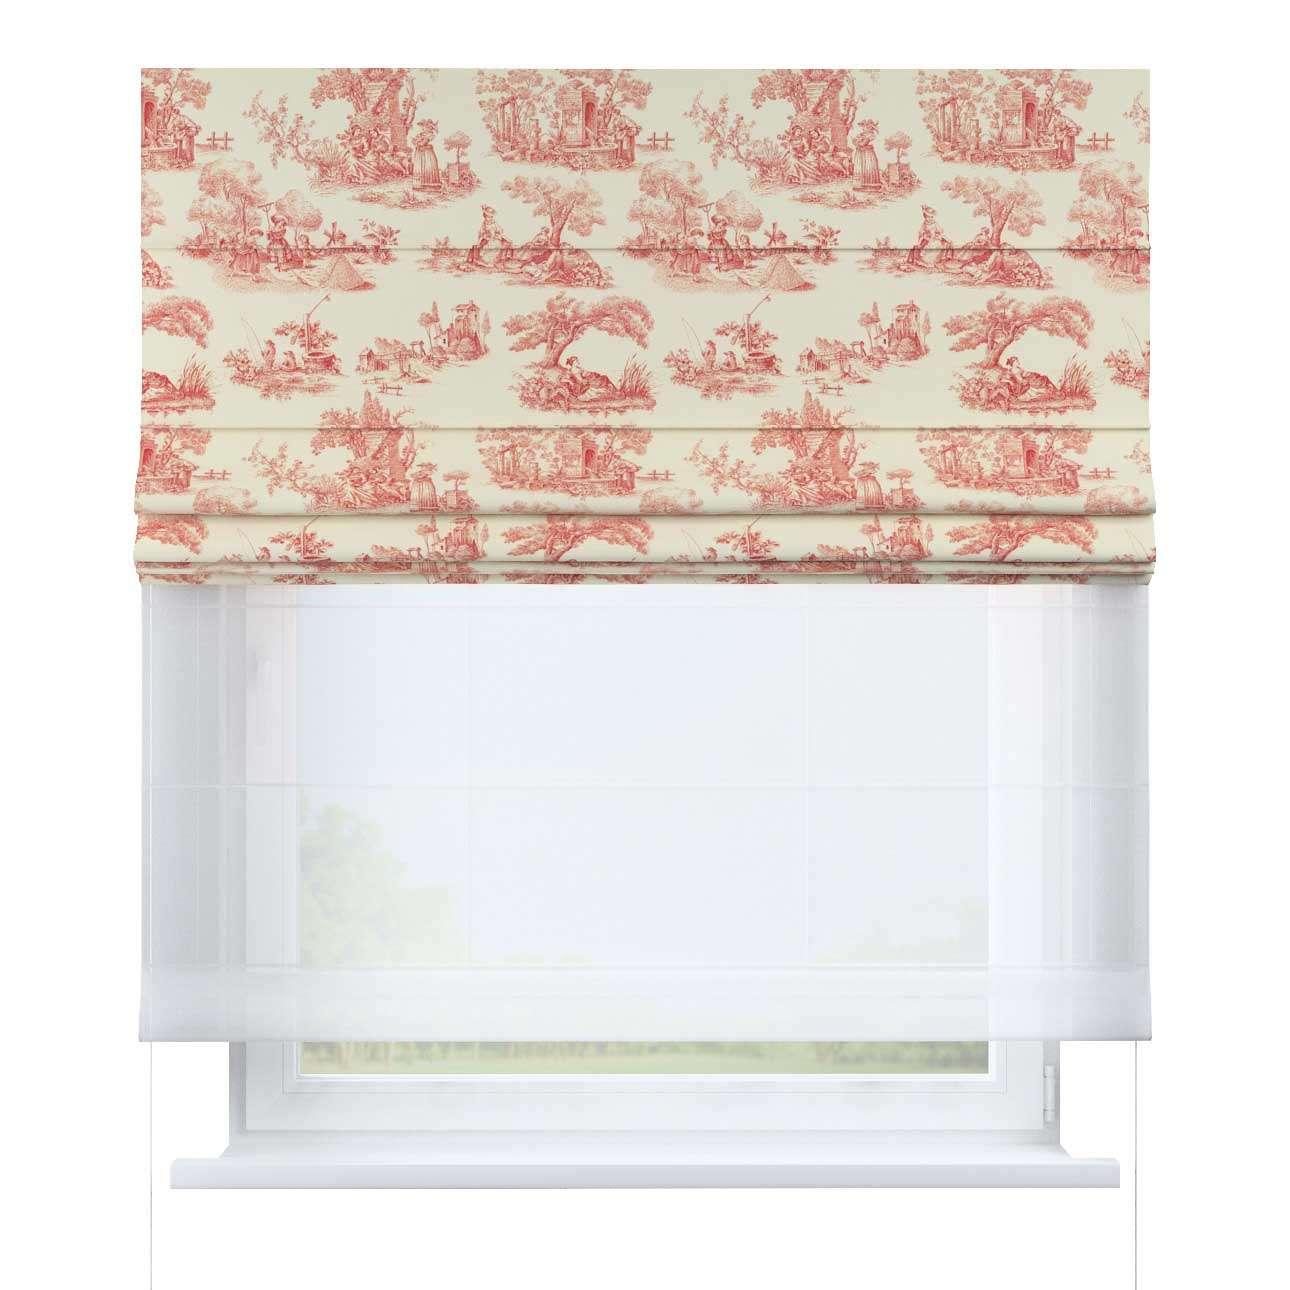 Roleta rzymska Duo w kolekcji Avinon, tkanina: 132-15